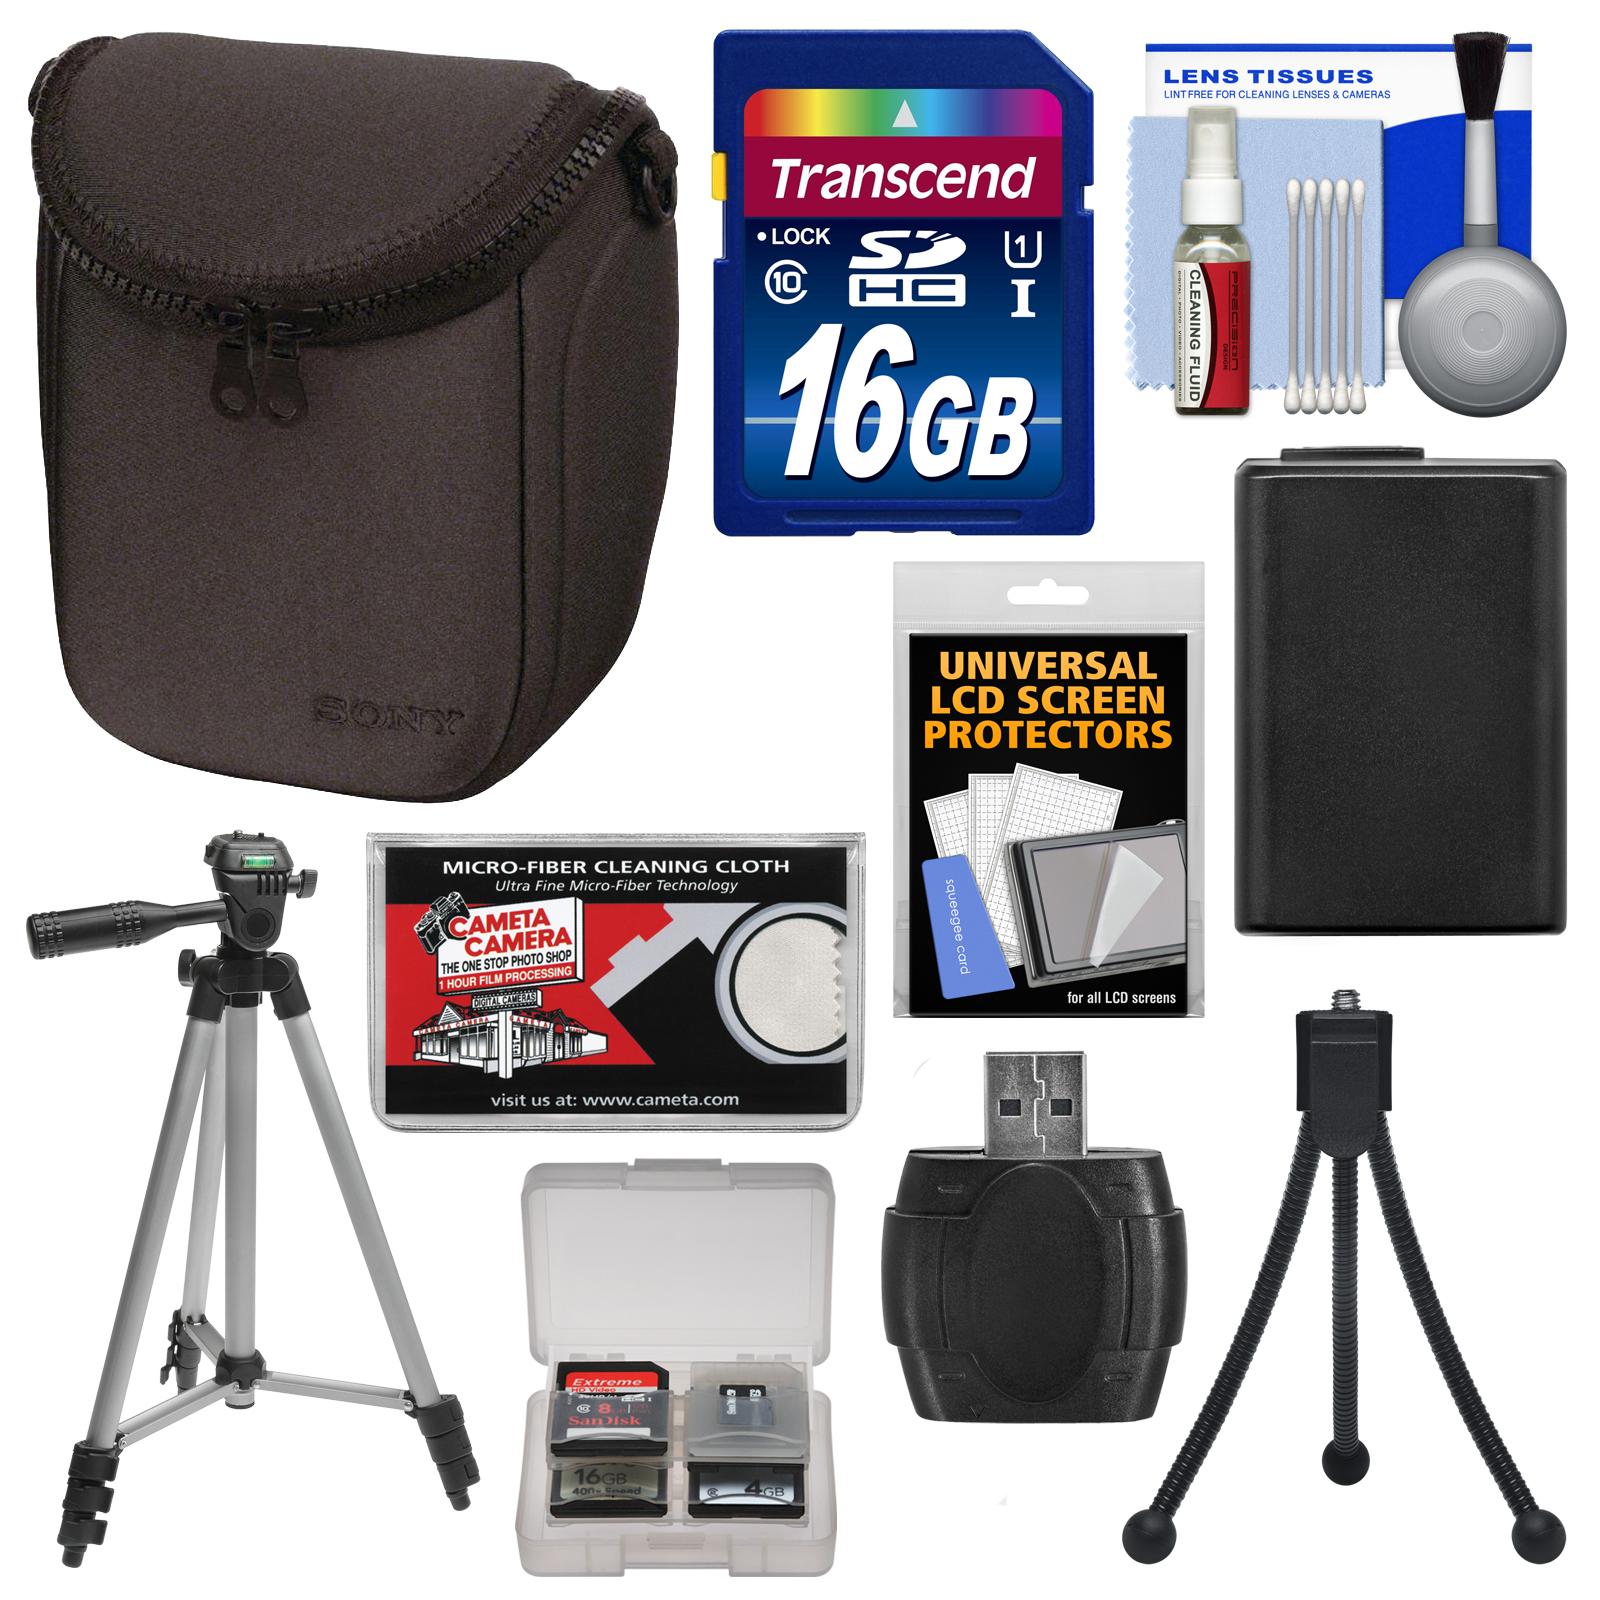 Sony LCS-BBF Soft Digital Camera Case (Black) with NP-FW5...